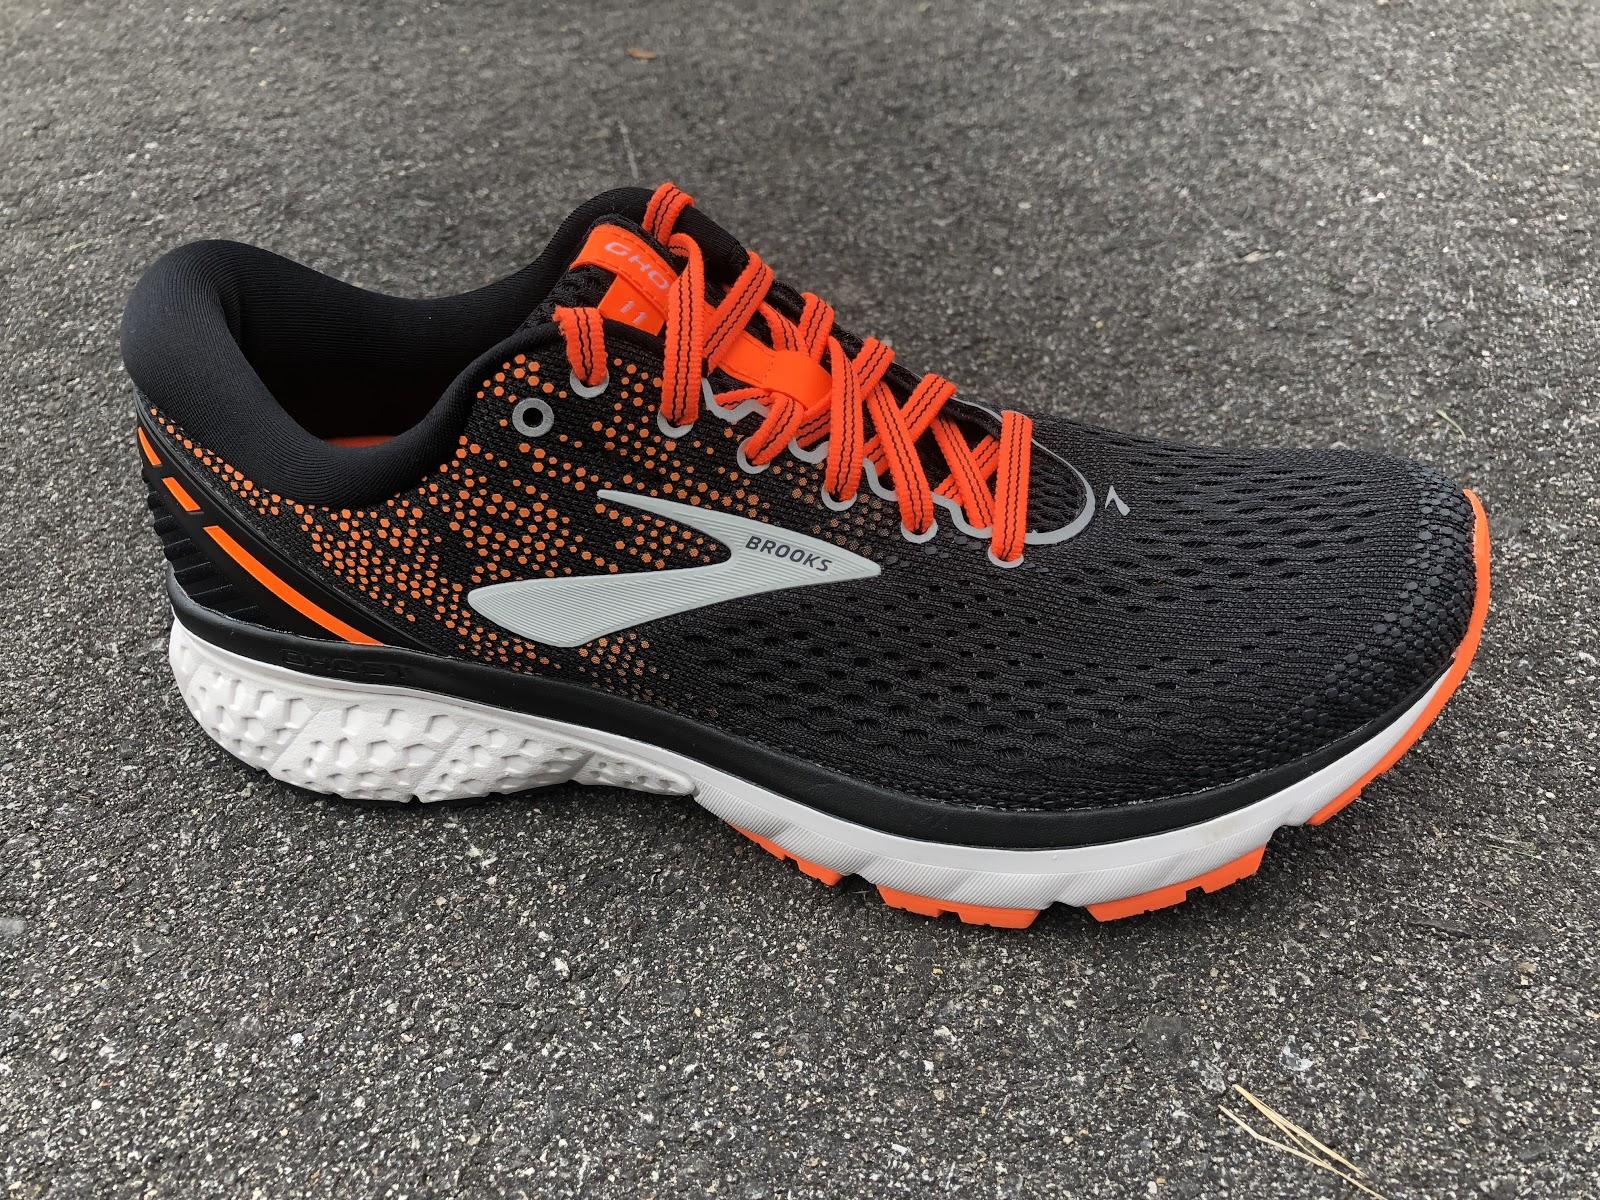 a67b3d9fdd1 Road Trail Run  Road Trail Run Year in Review   Sam s Running Shoes ...